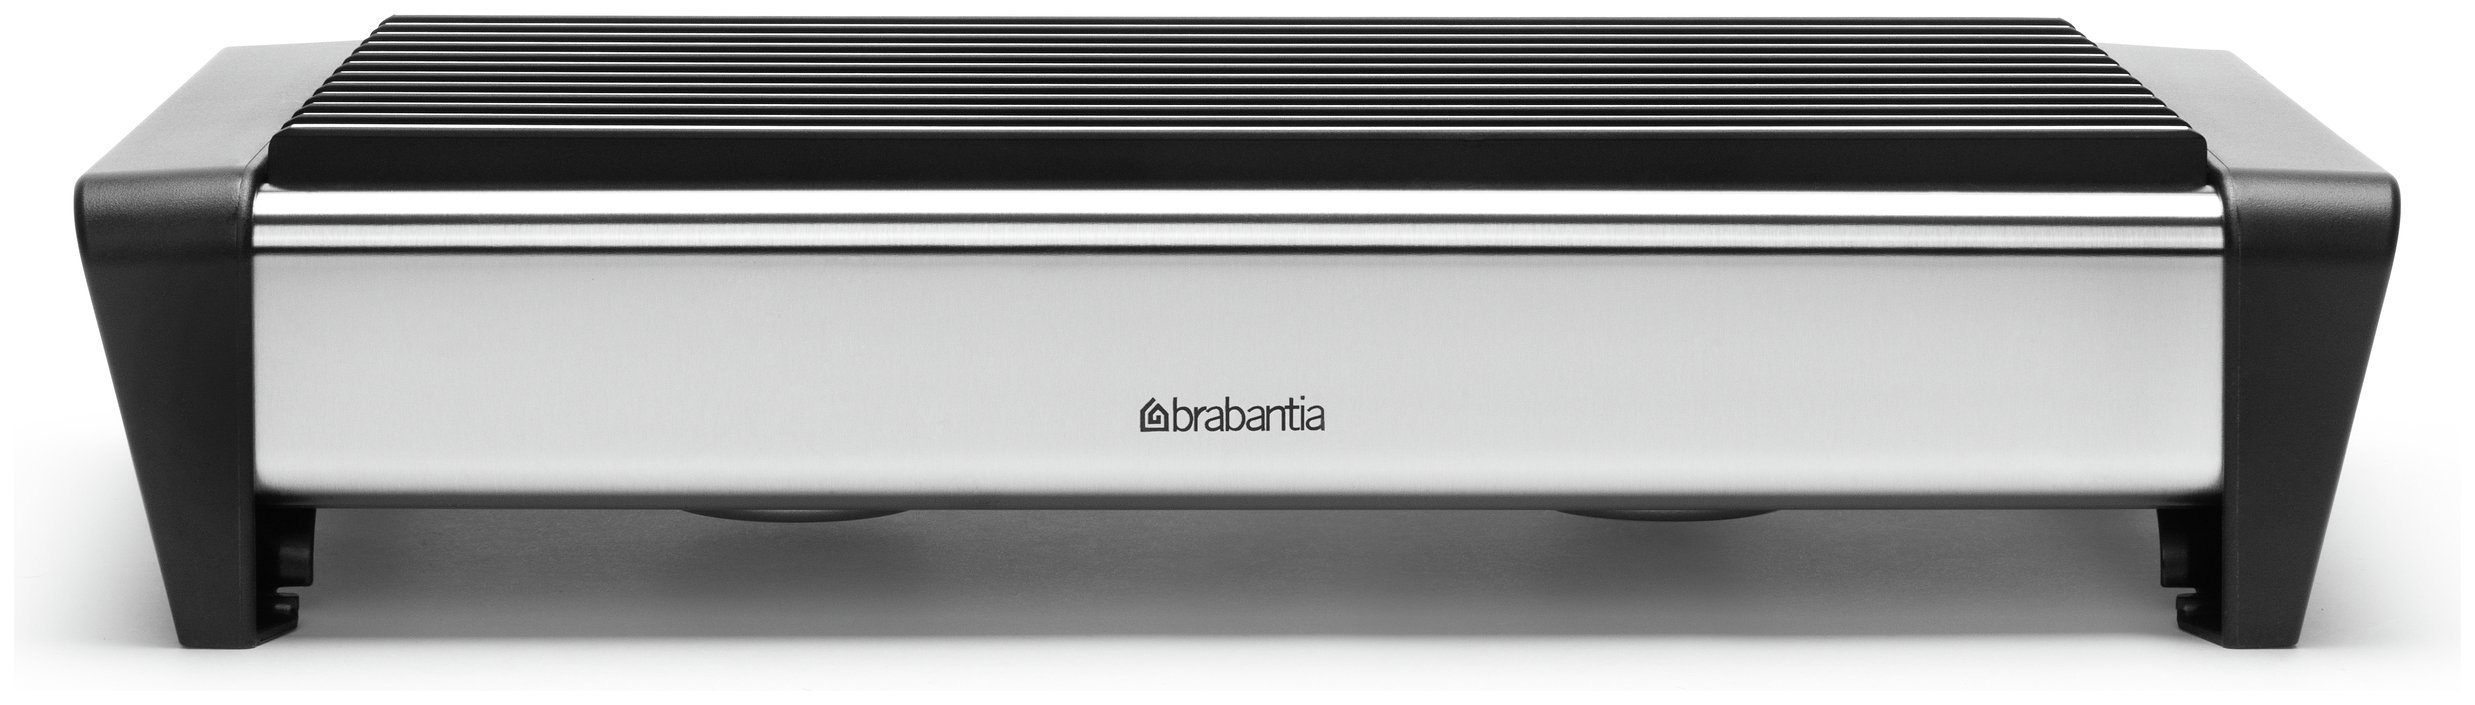 Image of Brabantia 2 Burner Food Warmer - Matt Stainless Steel